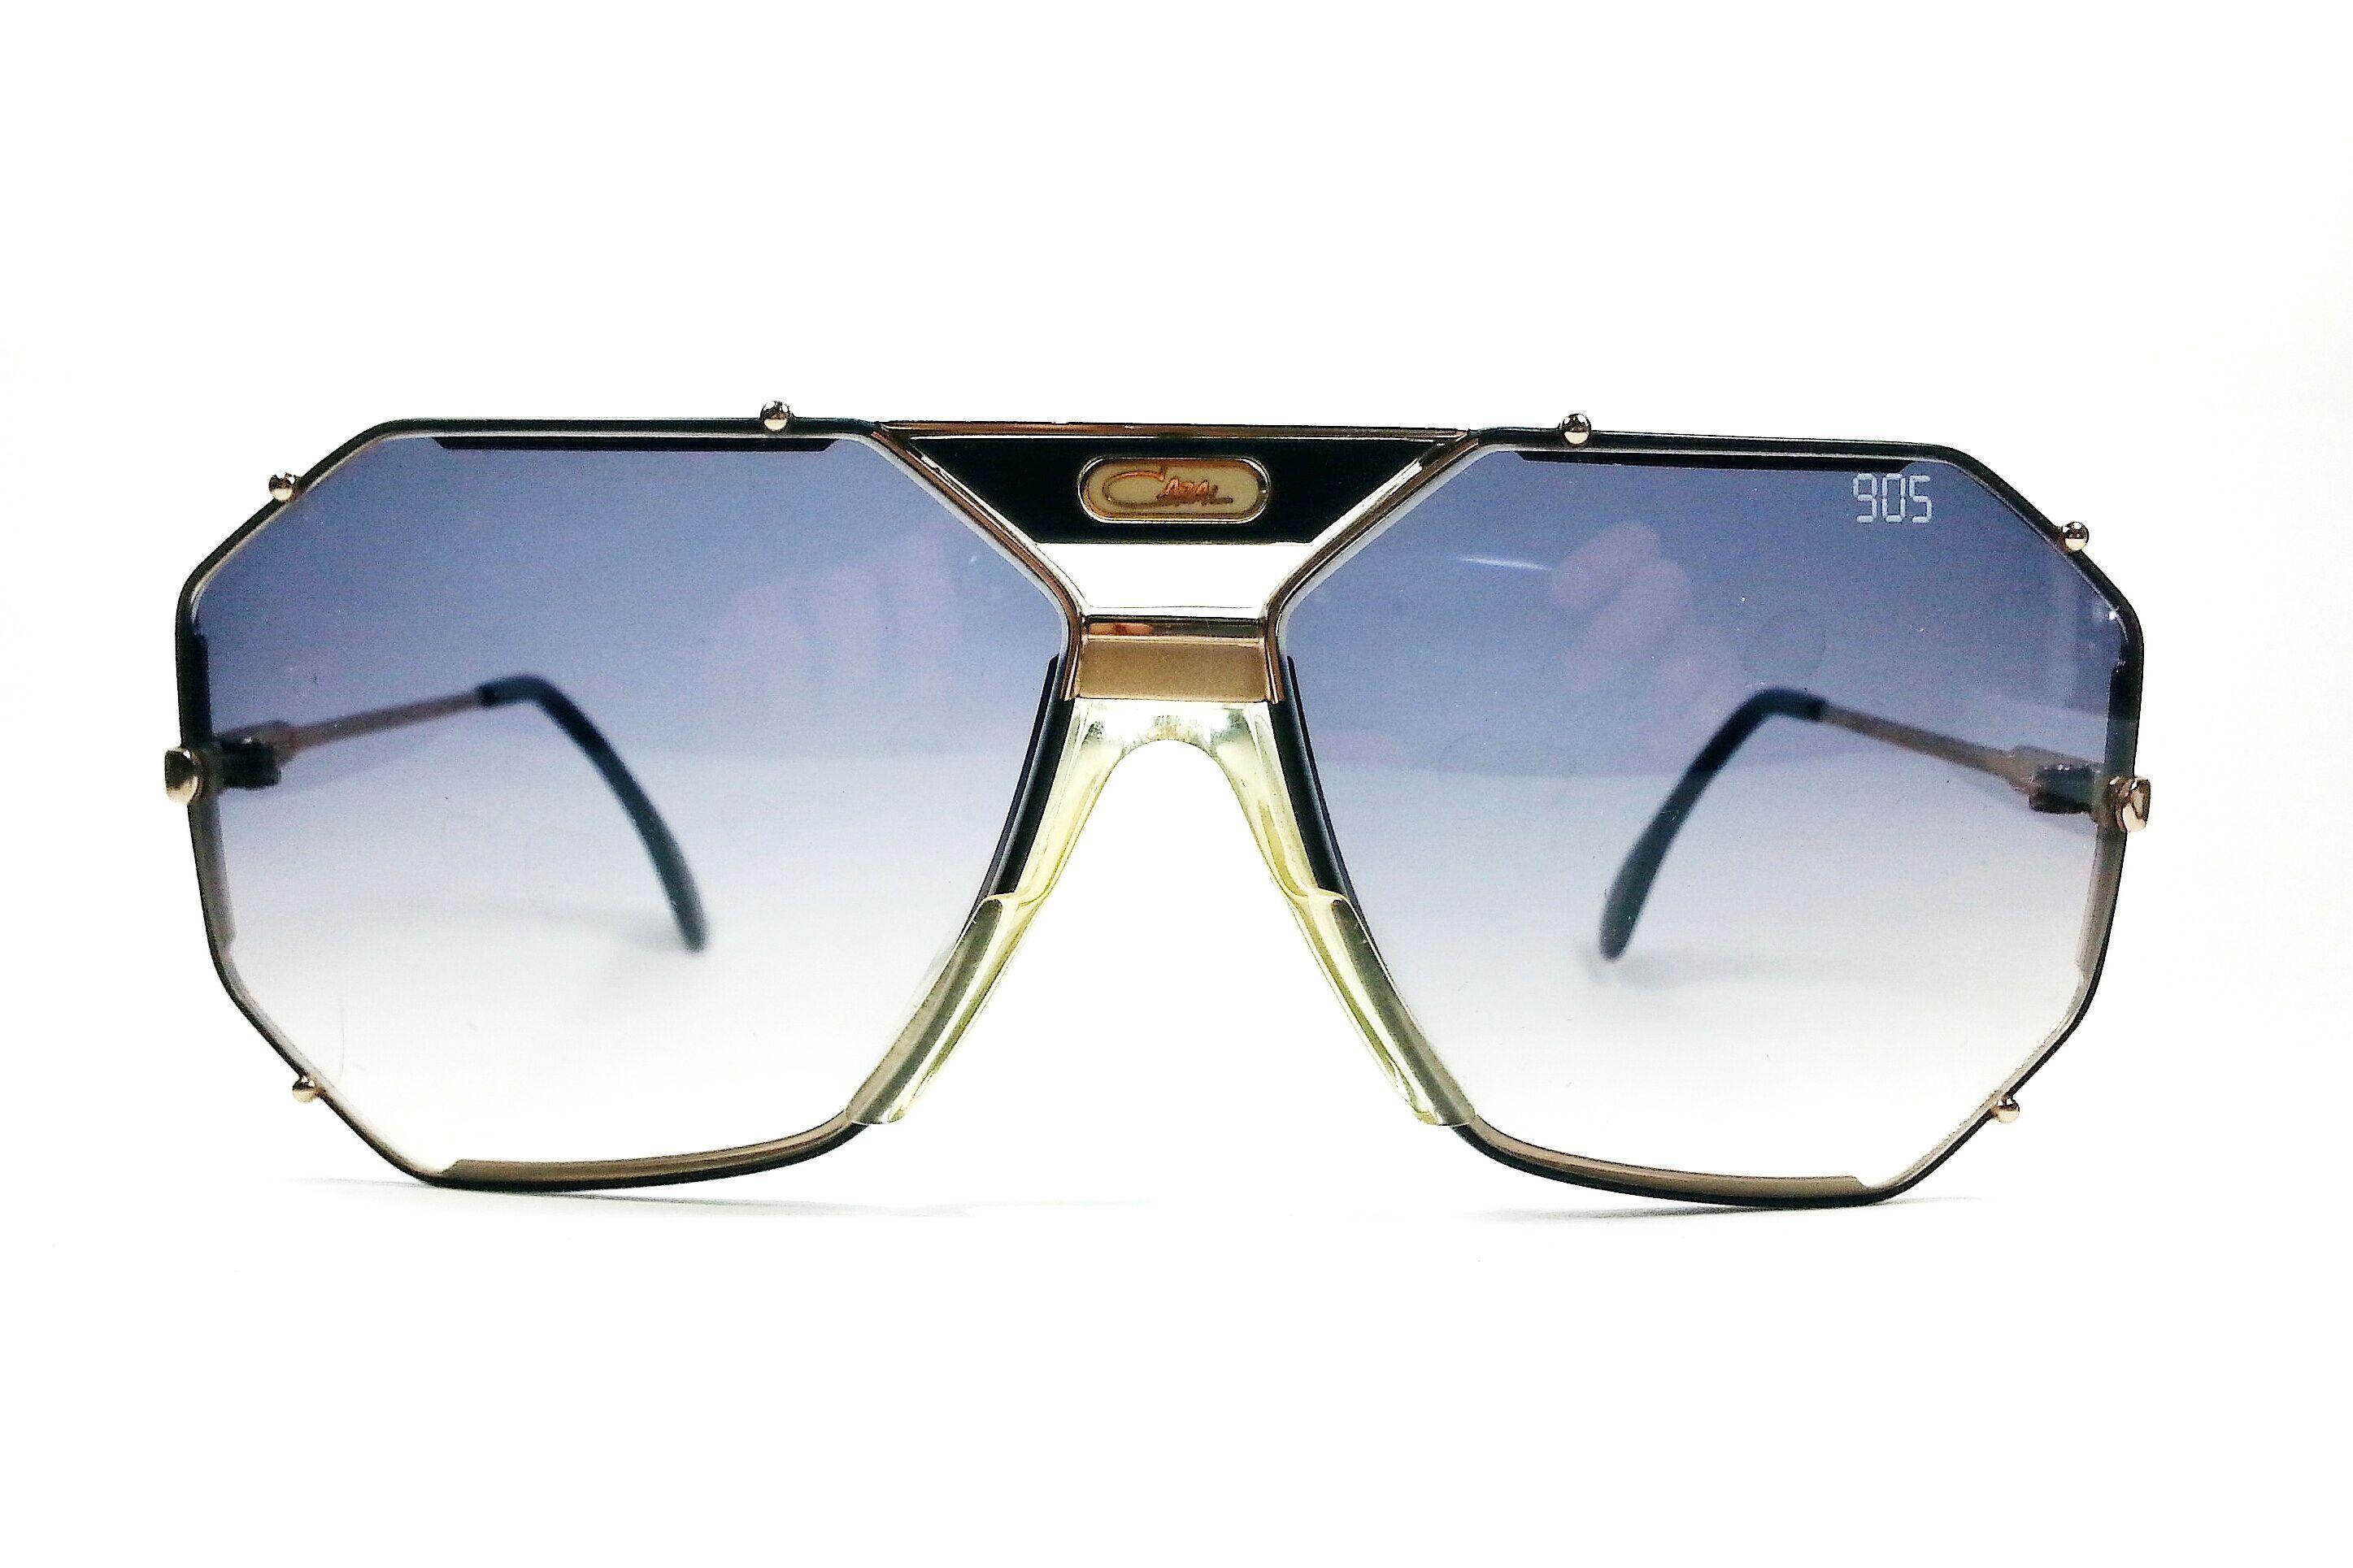 8d5f3d601c24 Wes Germany Vintage Cazal 905